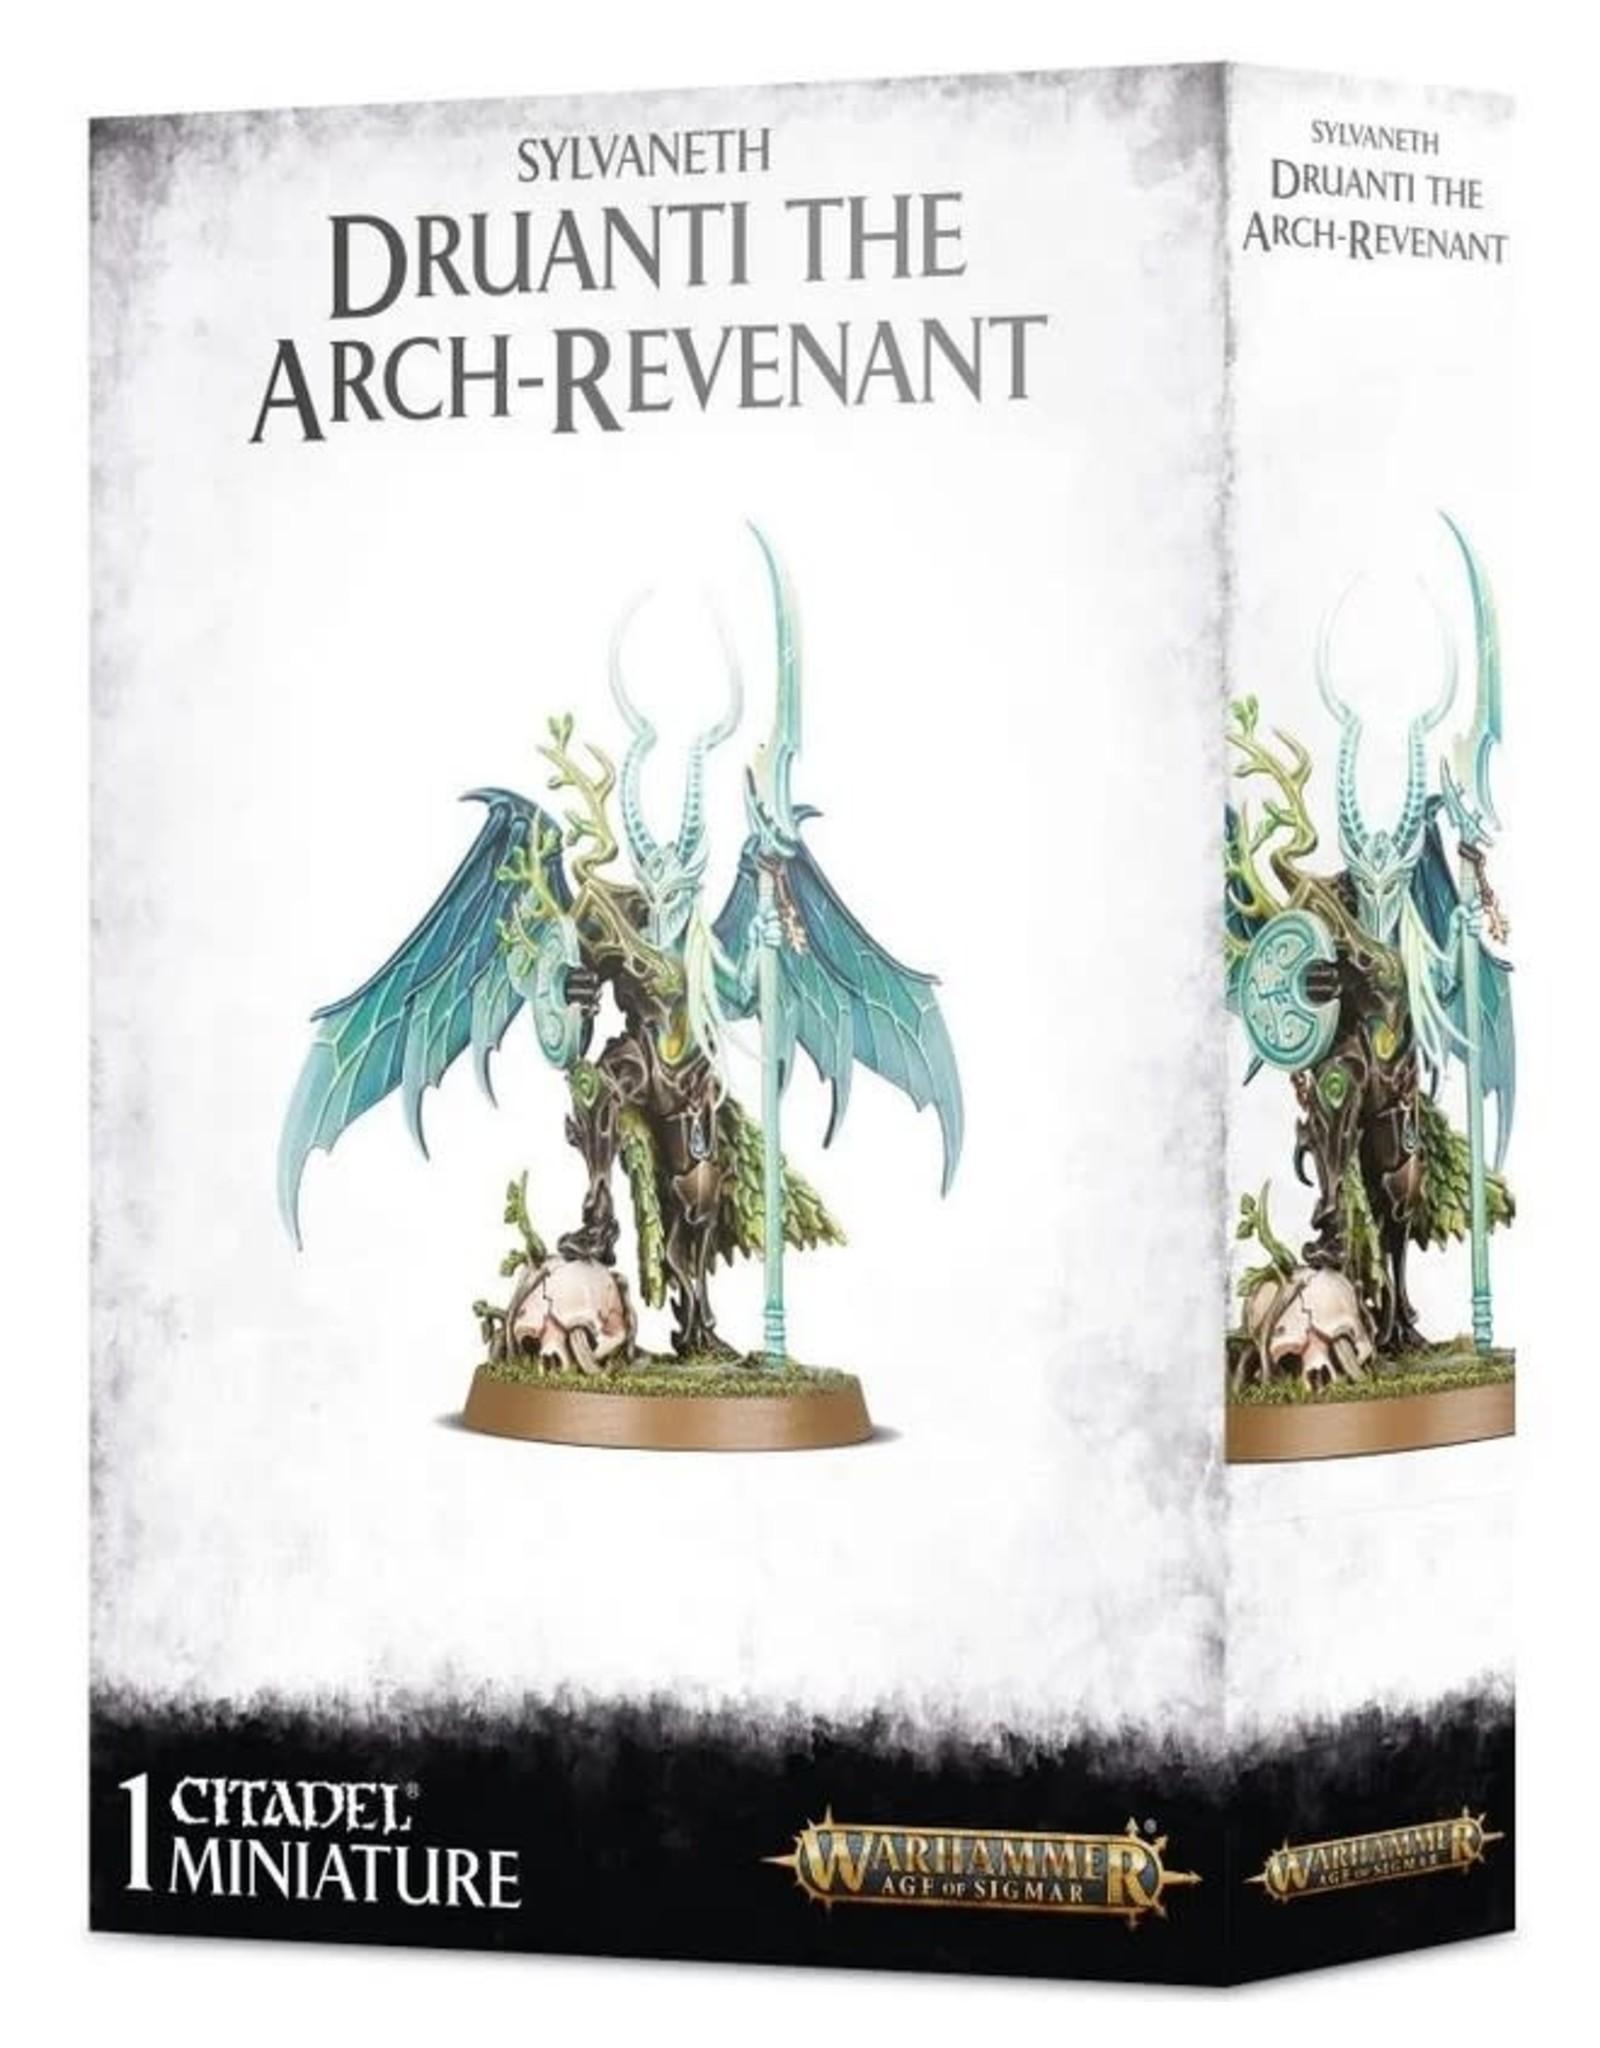 Warhammer AoS WHAoS Sylvaneth Druanti the Arch-Revenant